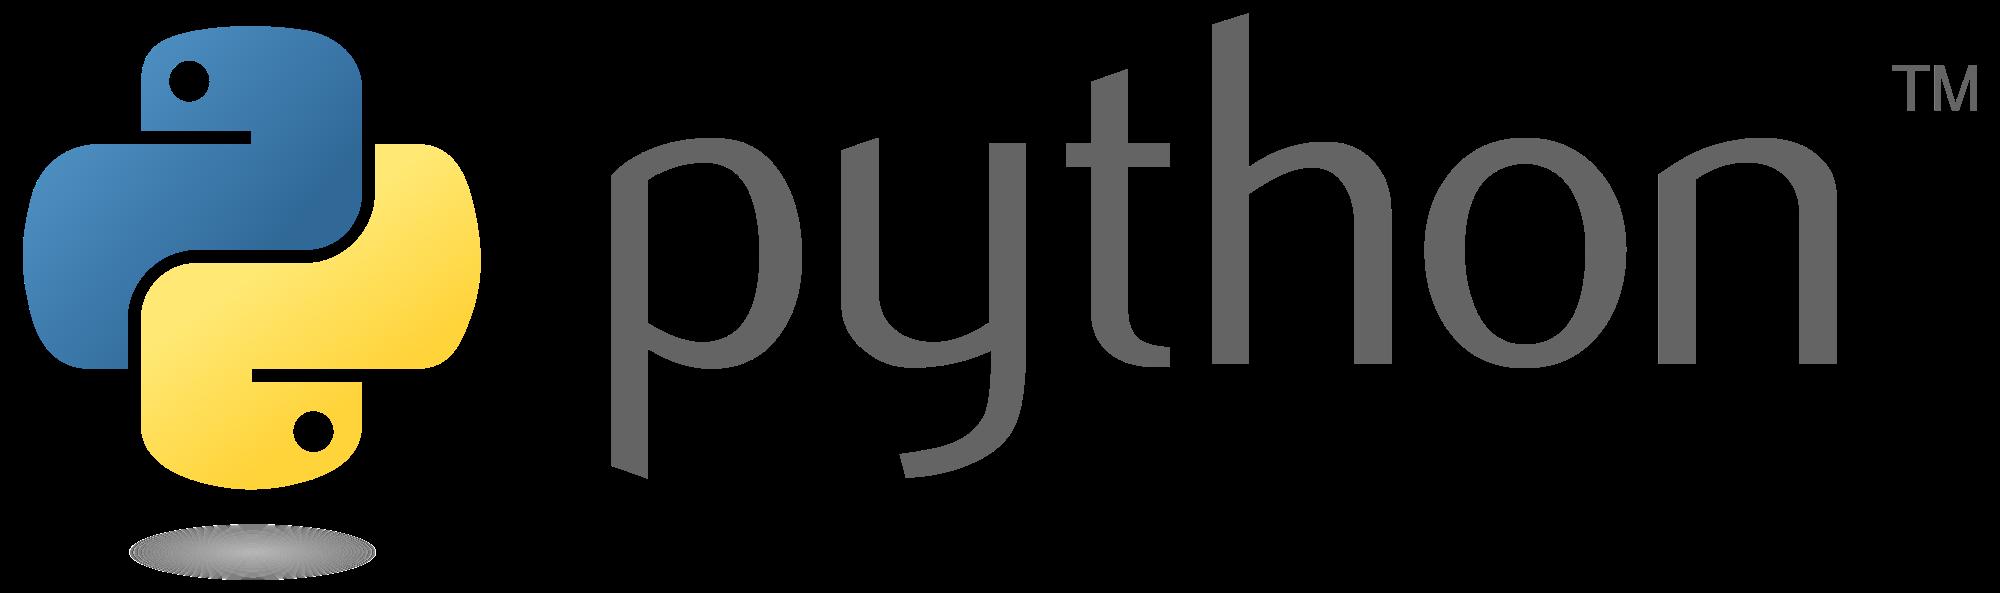 Phyton programming logo